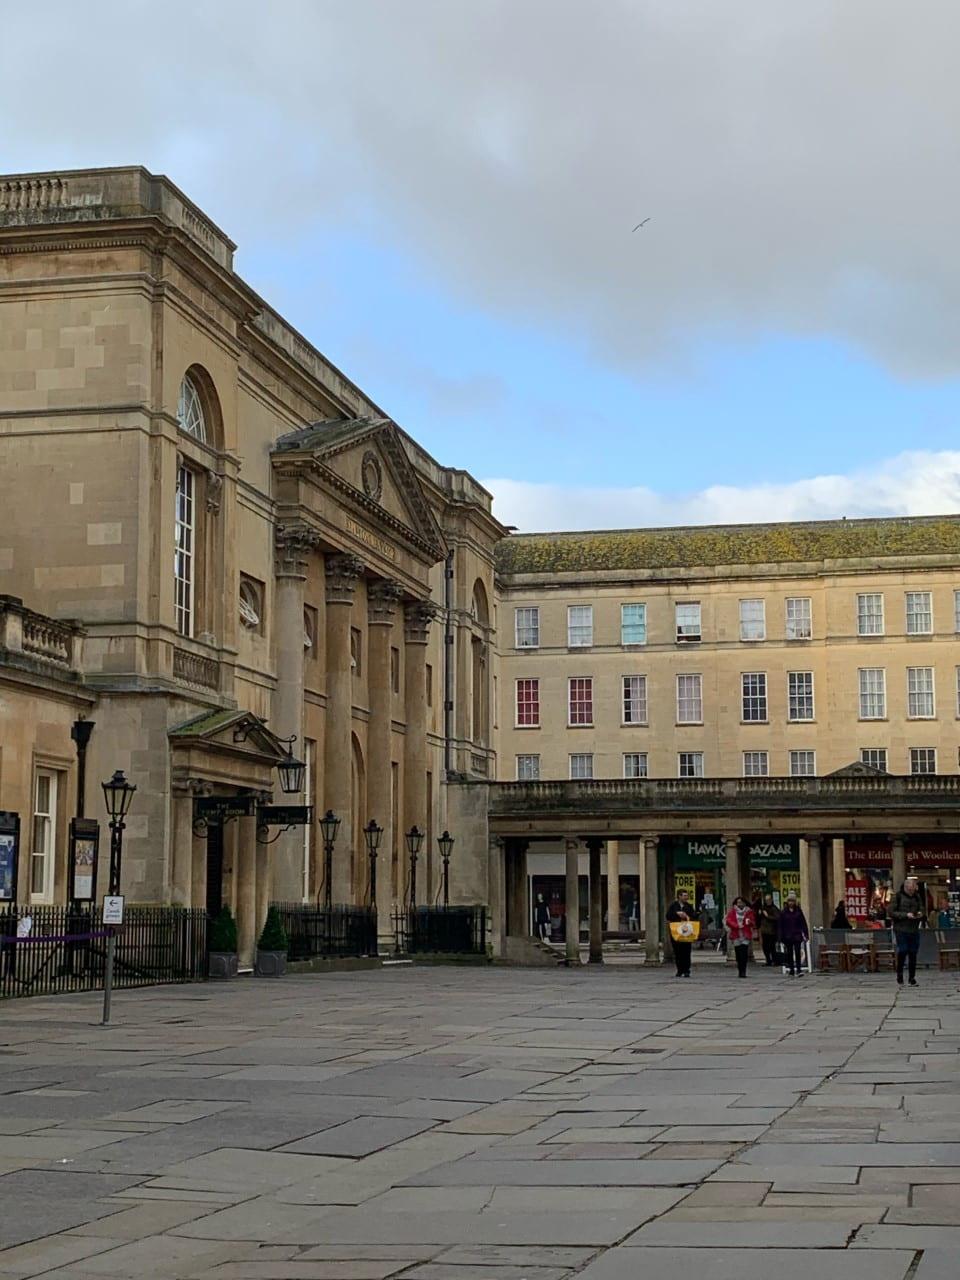 a large georgian building made of Bath stone